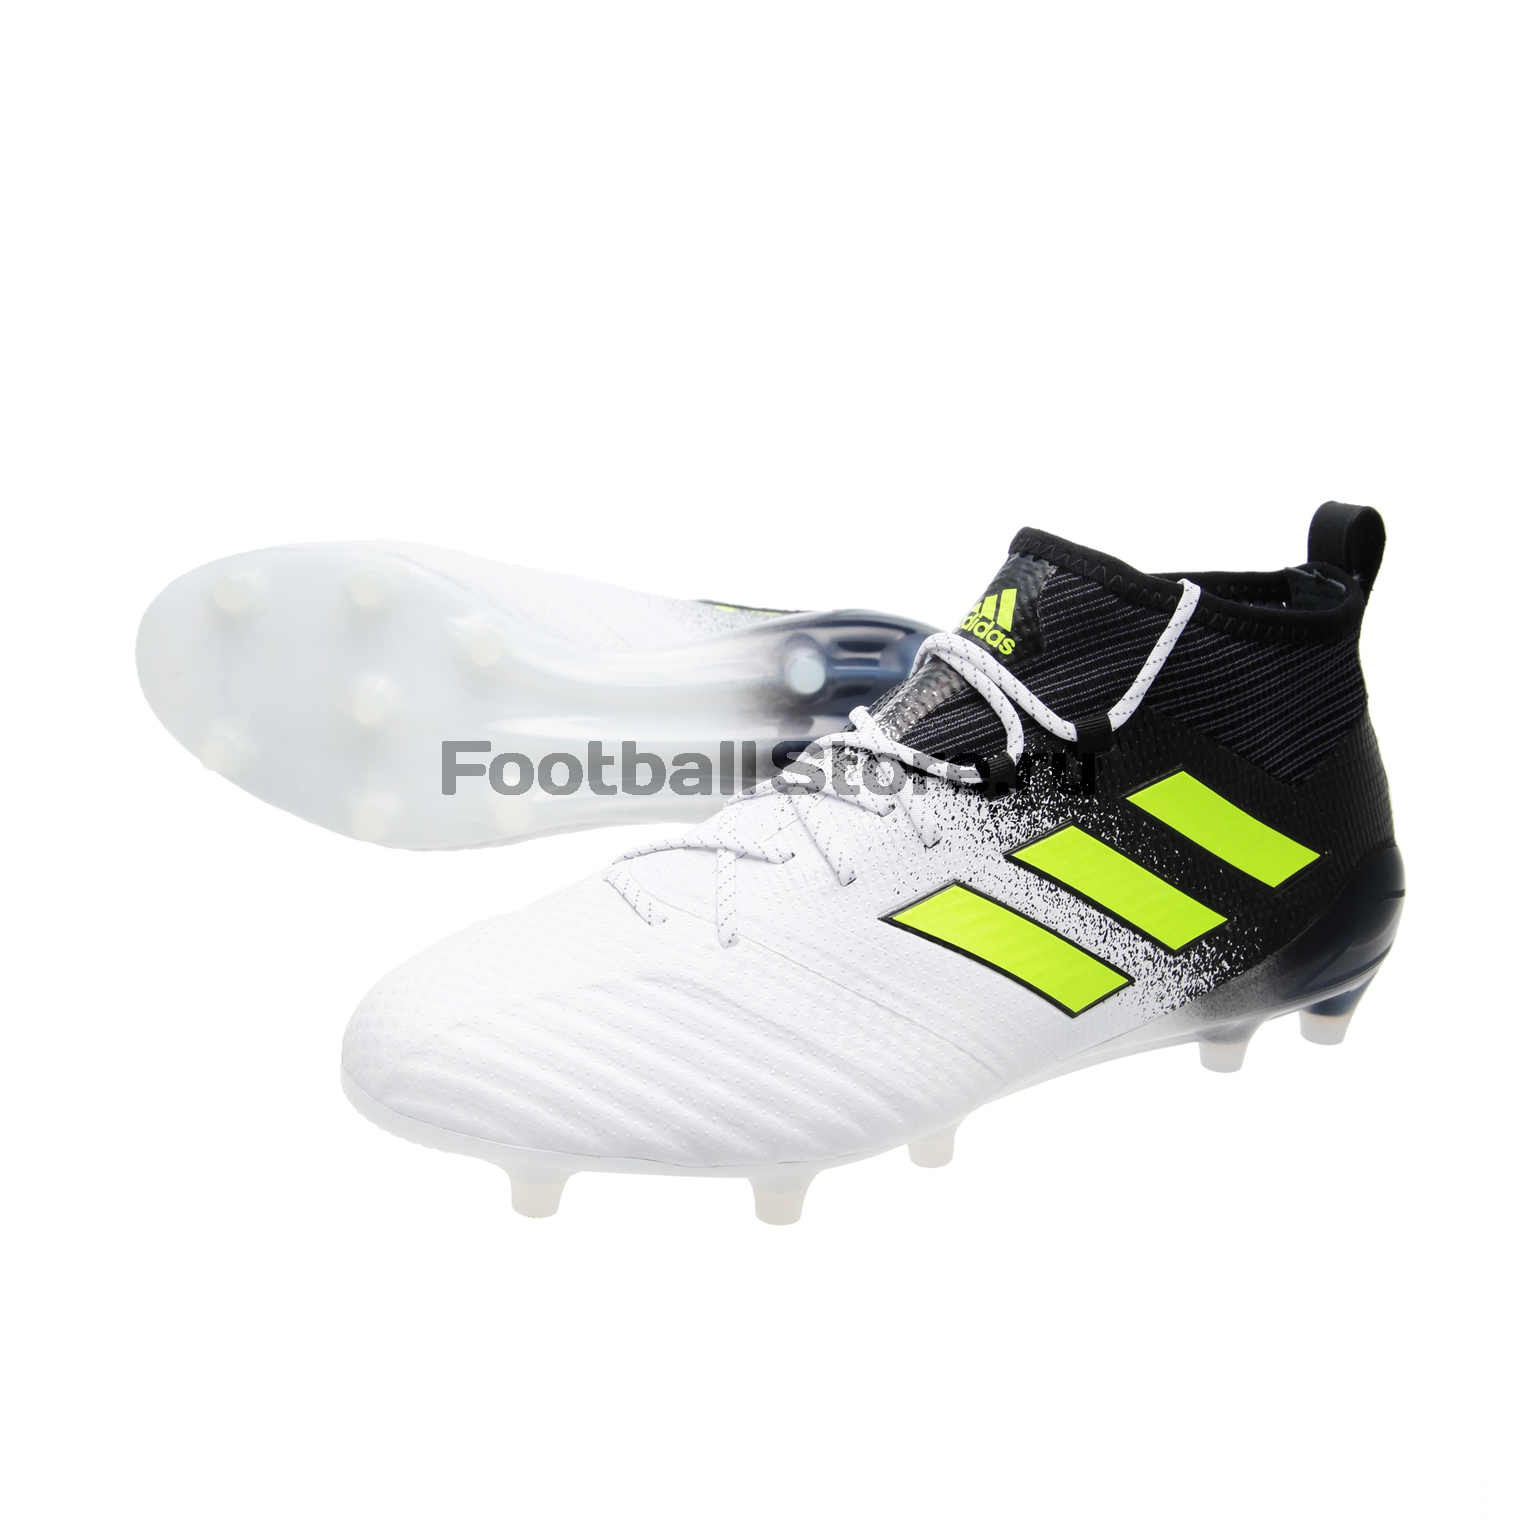 Игровые бутсы Adidas Бутсы Adidas ACE 17.1 FG S77035 цена